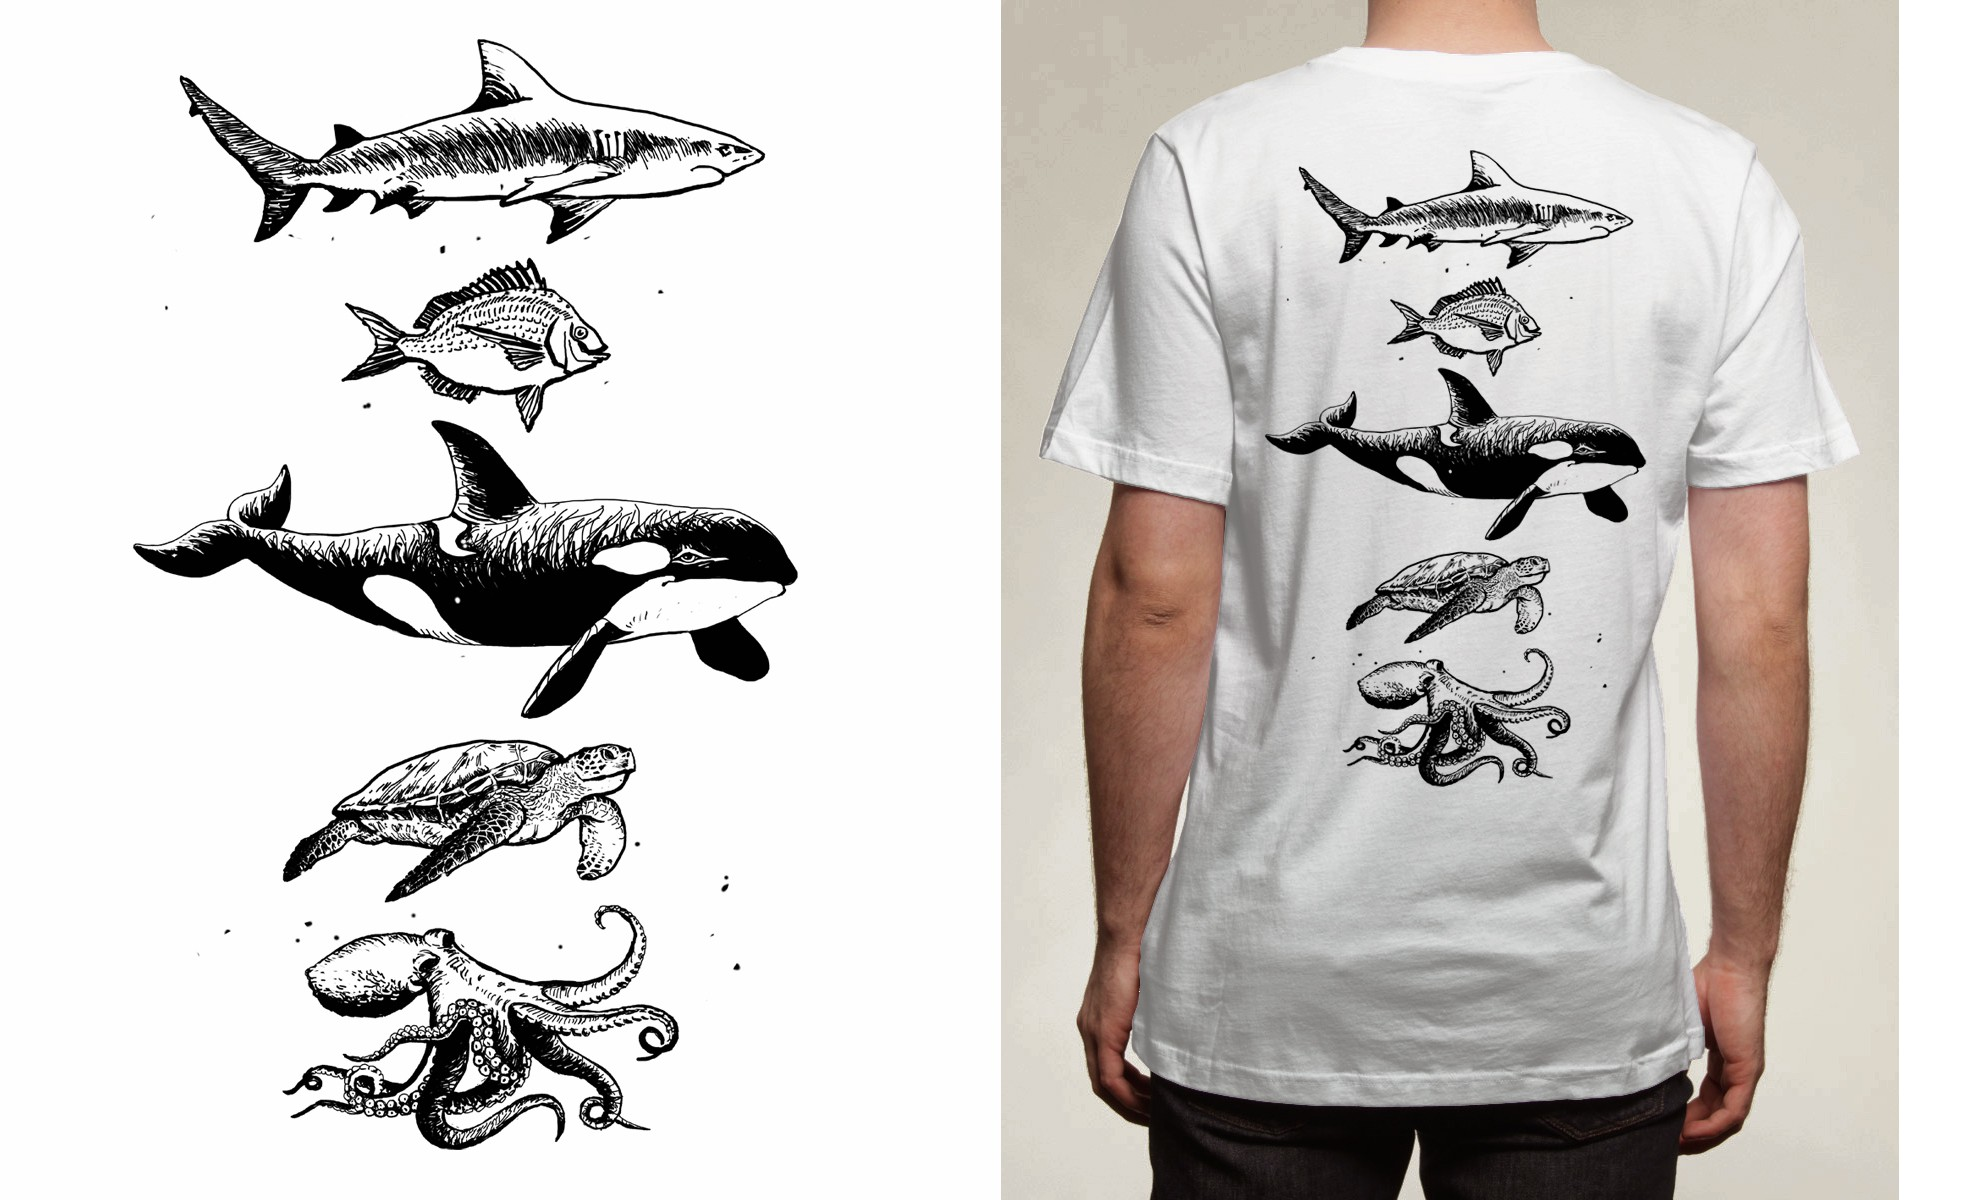 Design for back of T-shirt